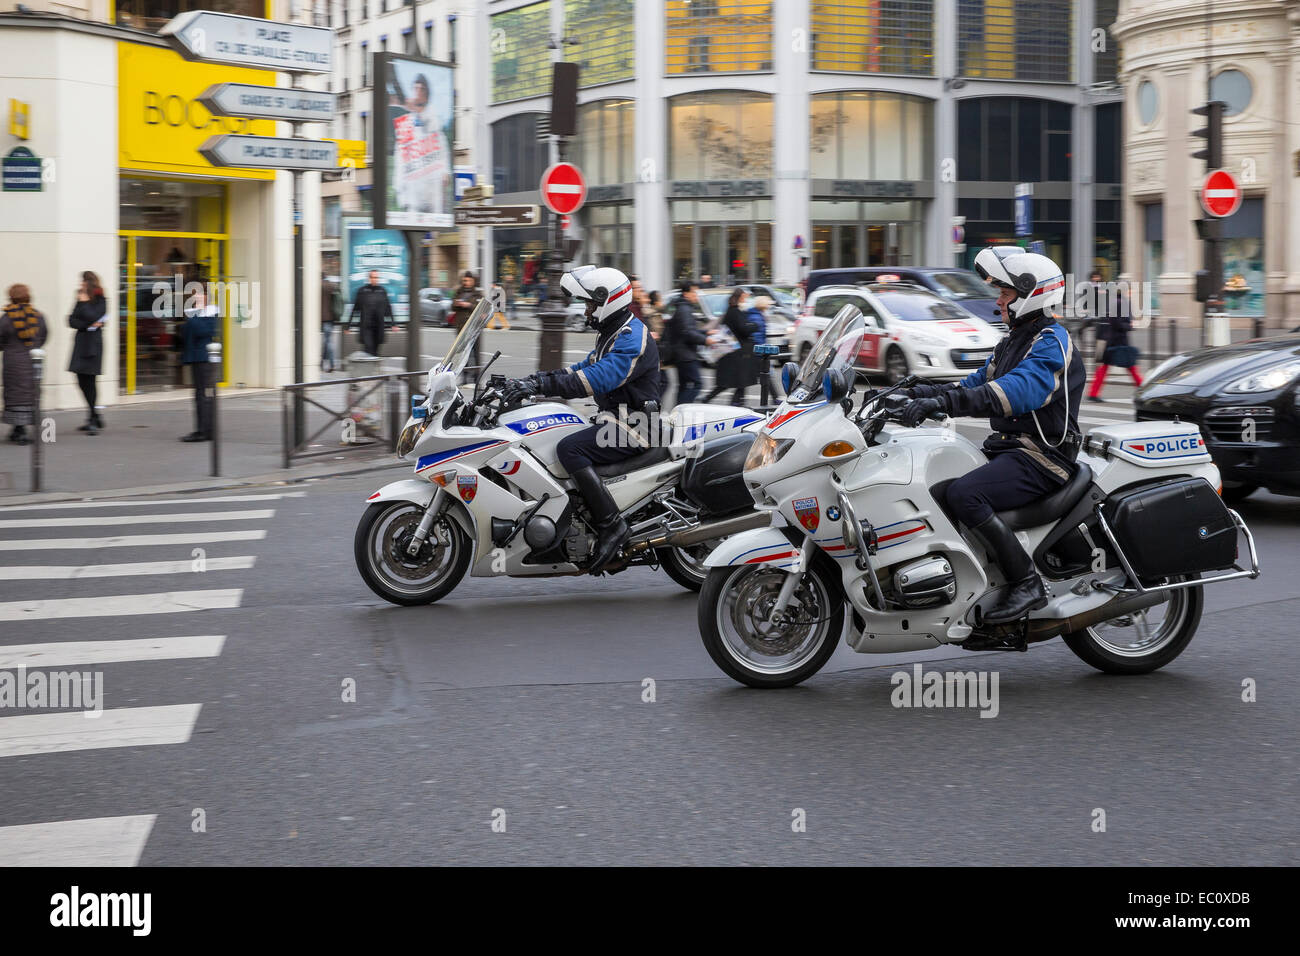 police nationale paris france motorcycle patrol stock photo royalty free image 76238103 alamy. Black Bedroom Furniture Sets. Home Design Ideas